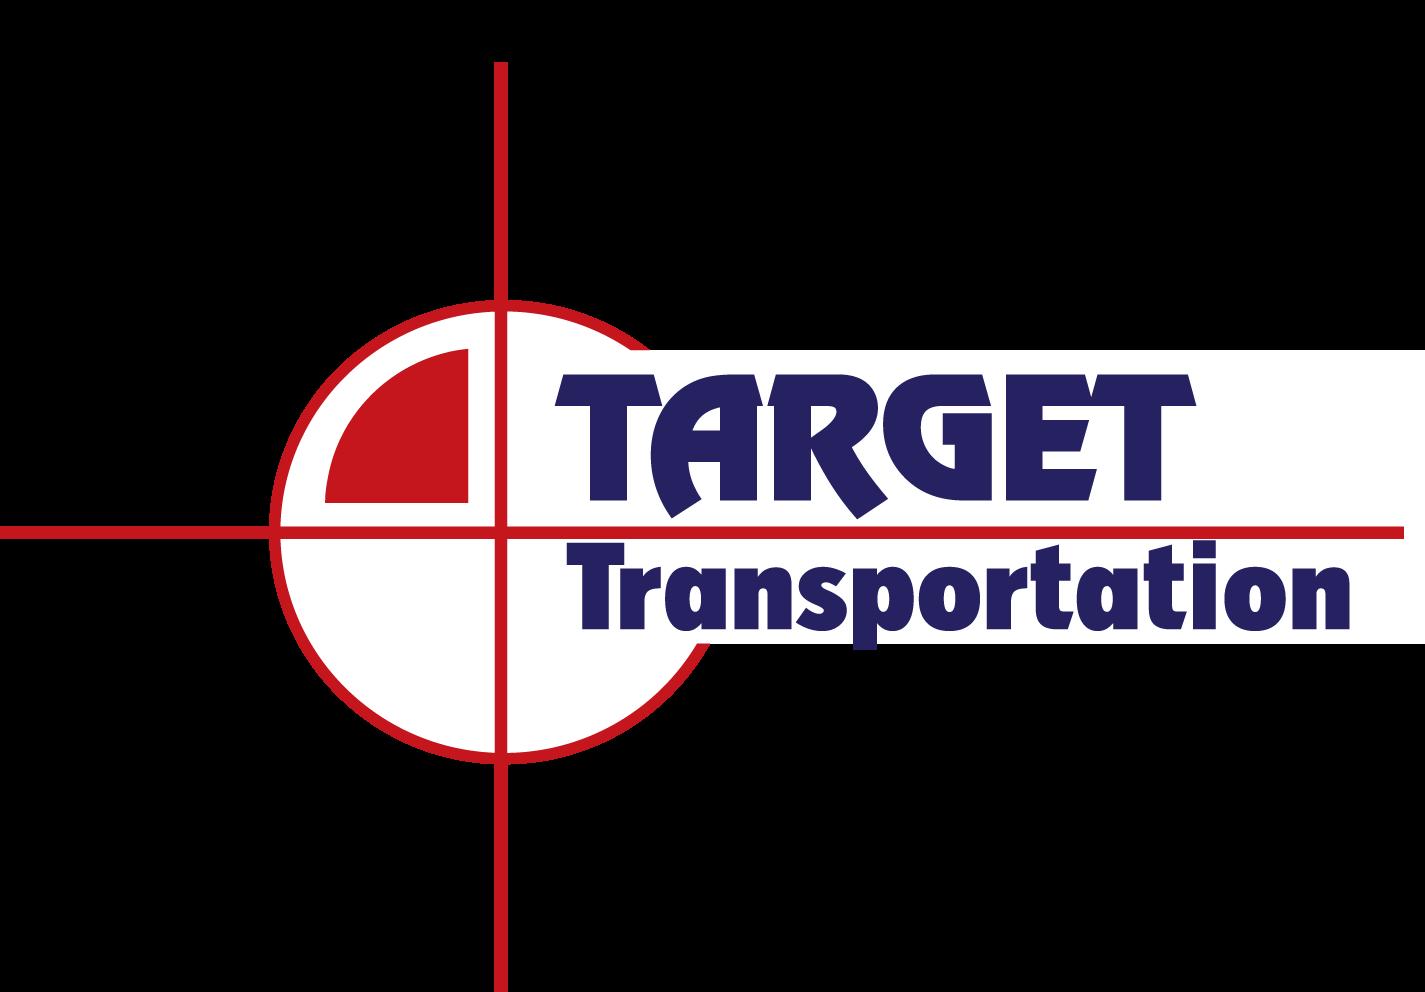 Target Transportation Icon